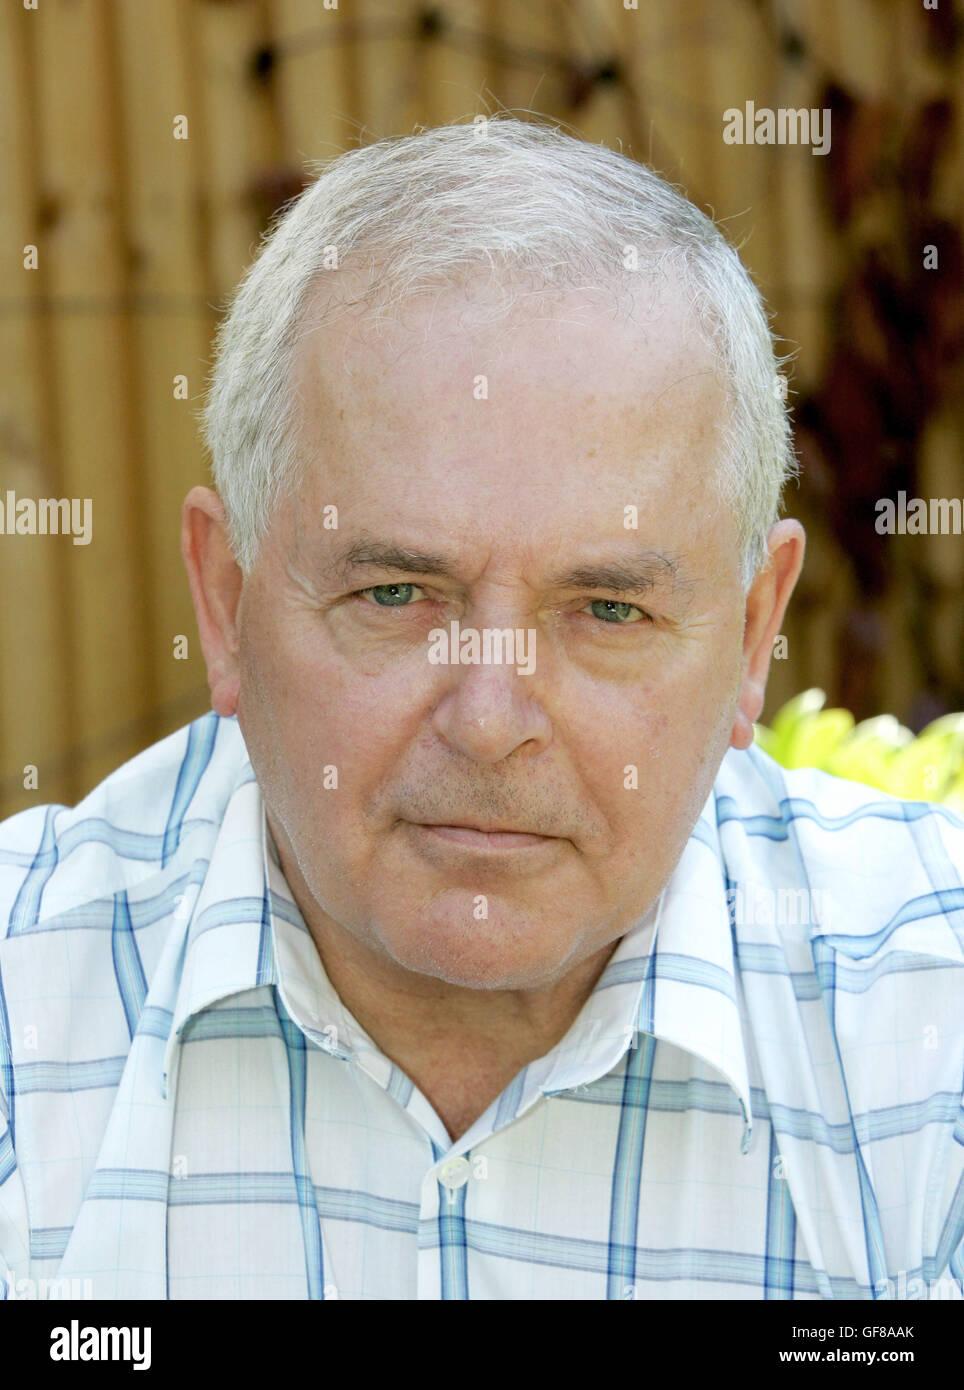 Professor Jim Ryan OStJ MCh FRCS DMCC at his home in Farnborough Hants after the London bombings, Britain 10.07.05. Stock Photo